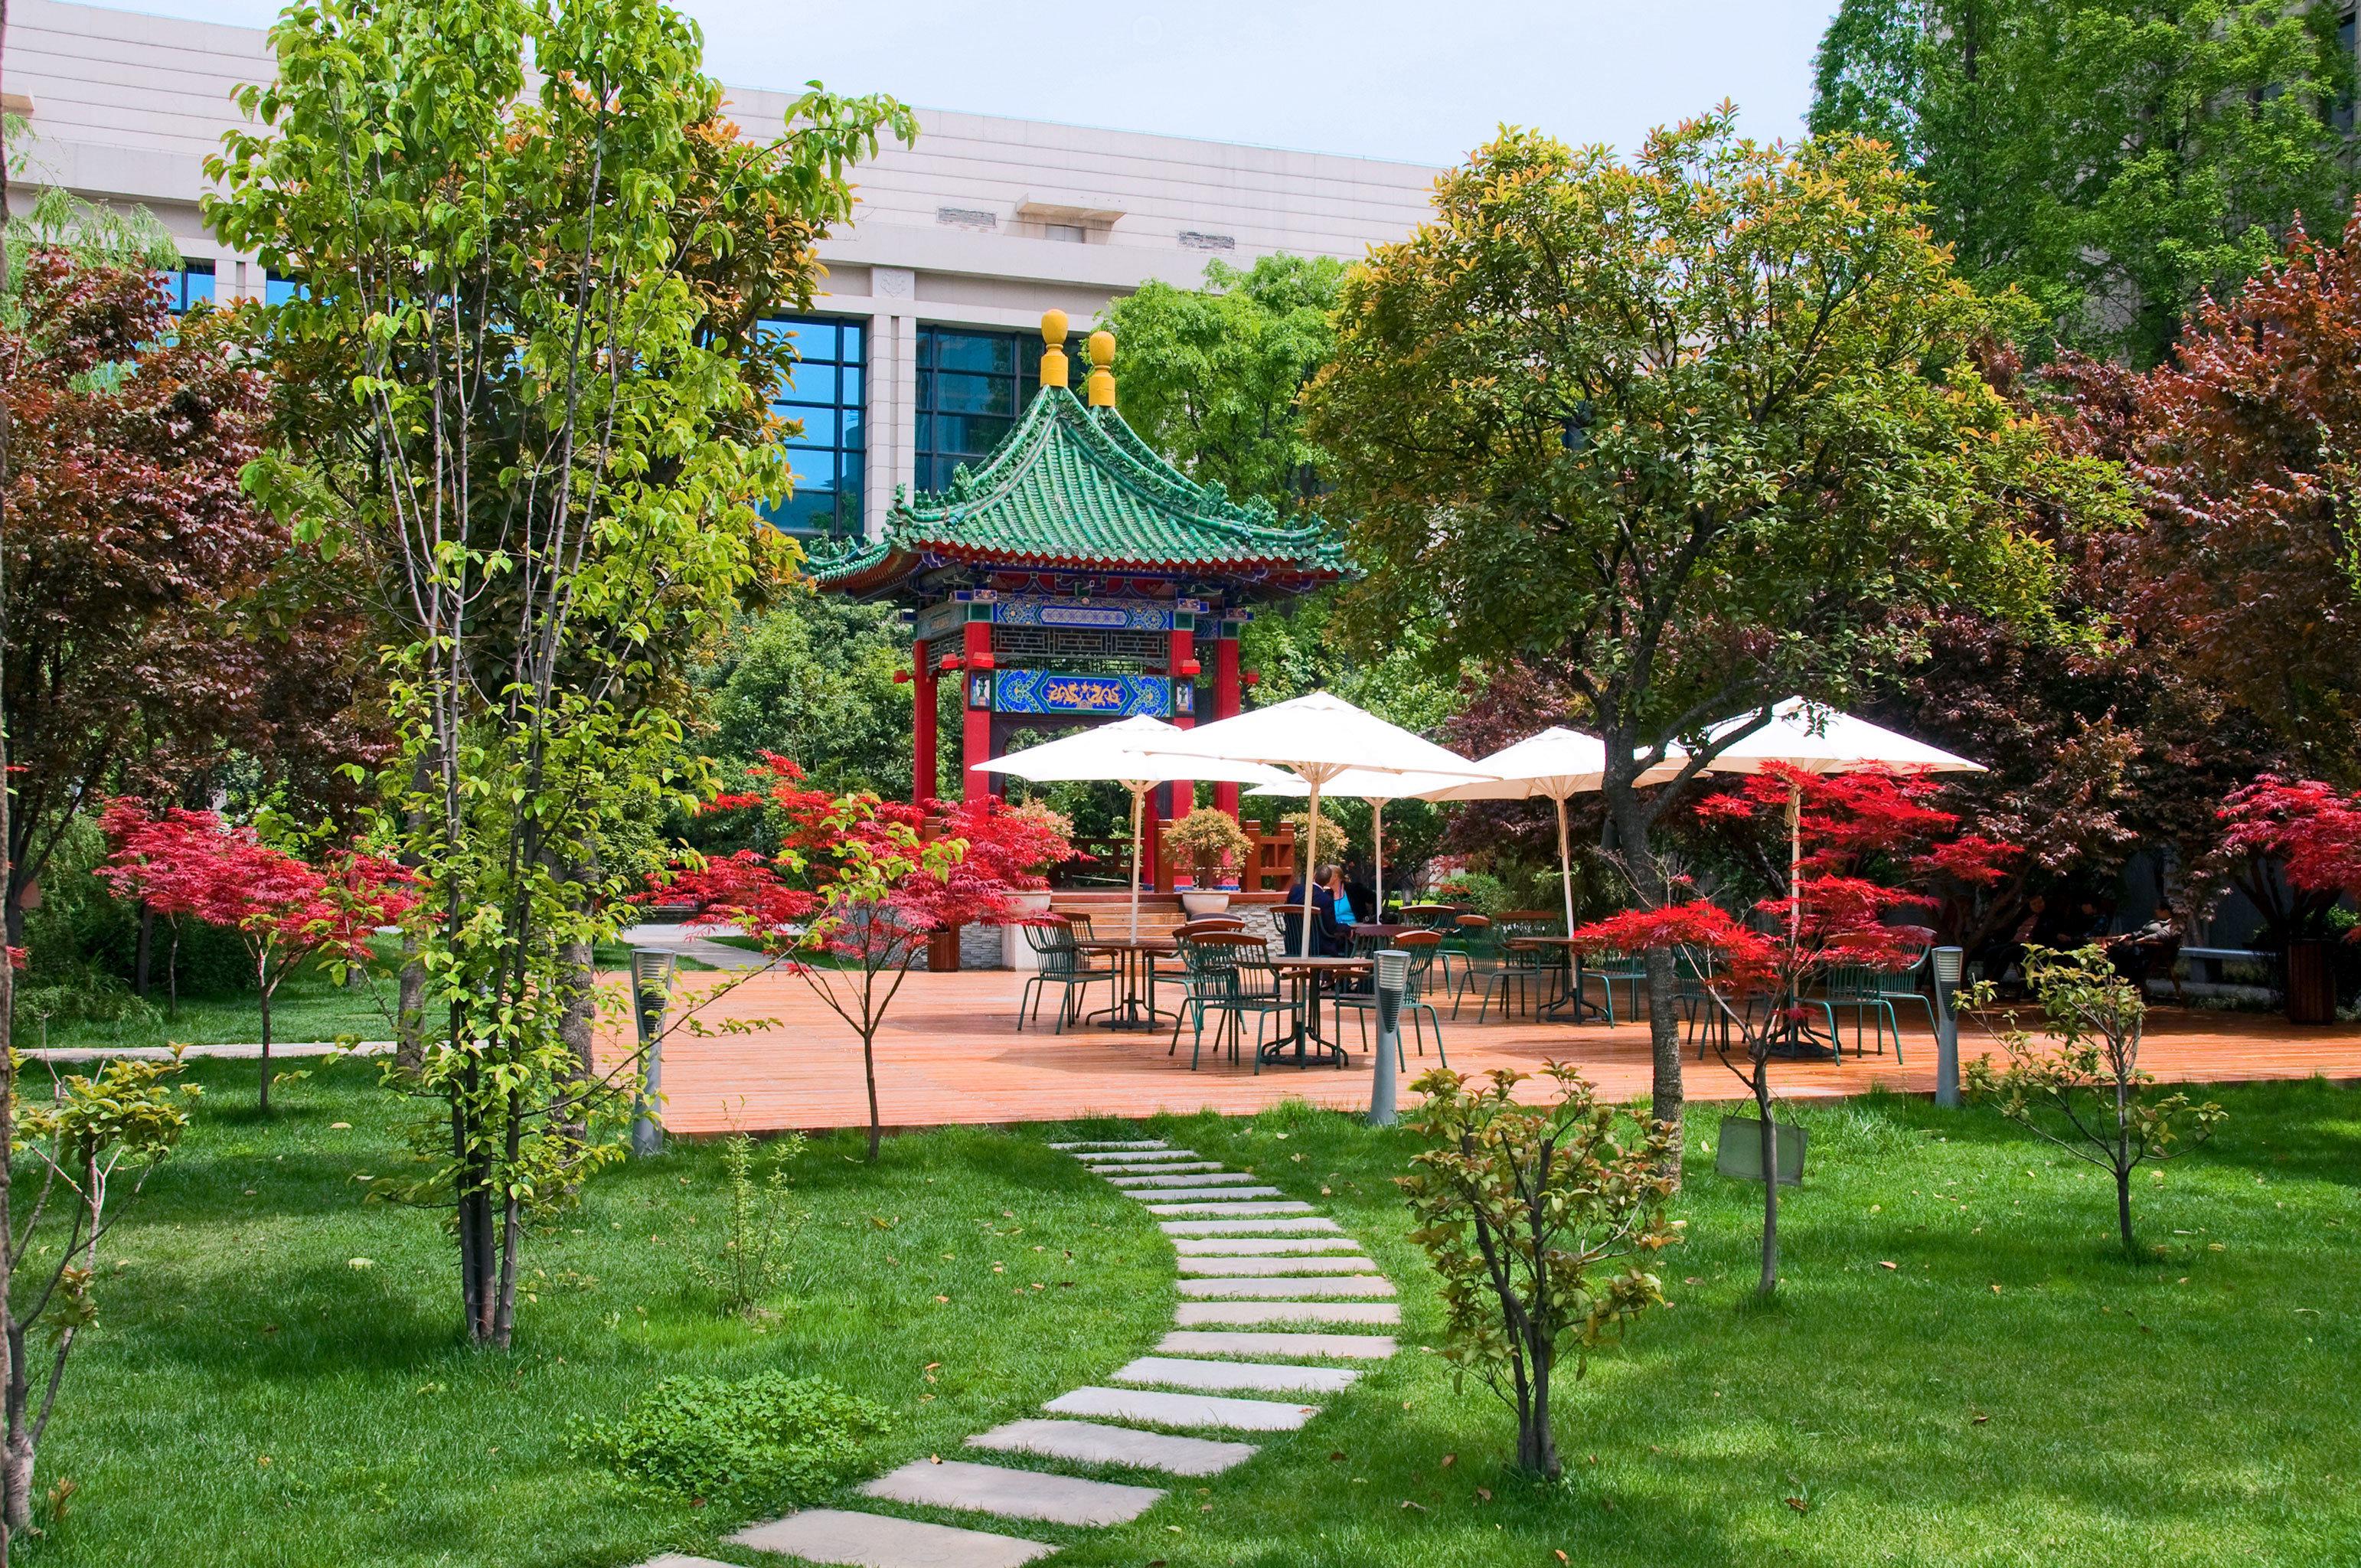 Grounds Outdoors Patio Resort Scenic views grass tree lawn Garden flower backyard yard park cottage grassy lush